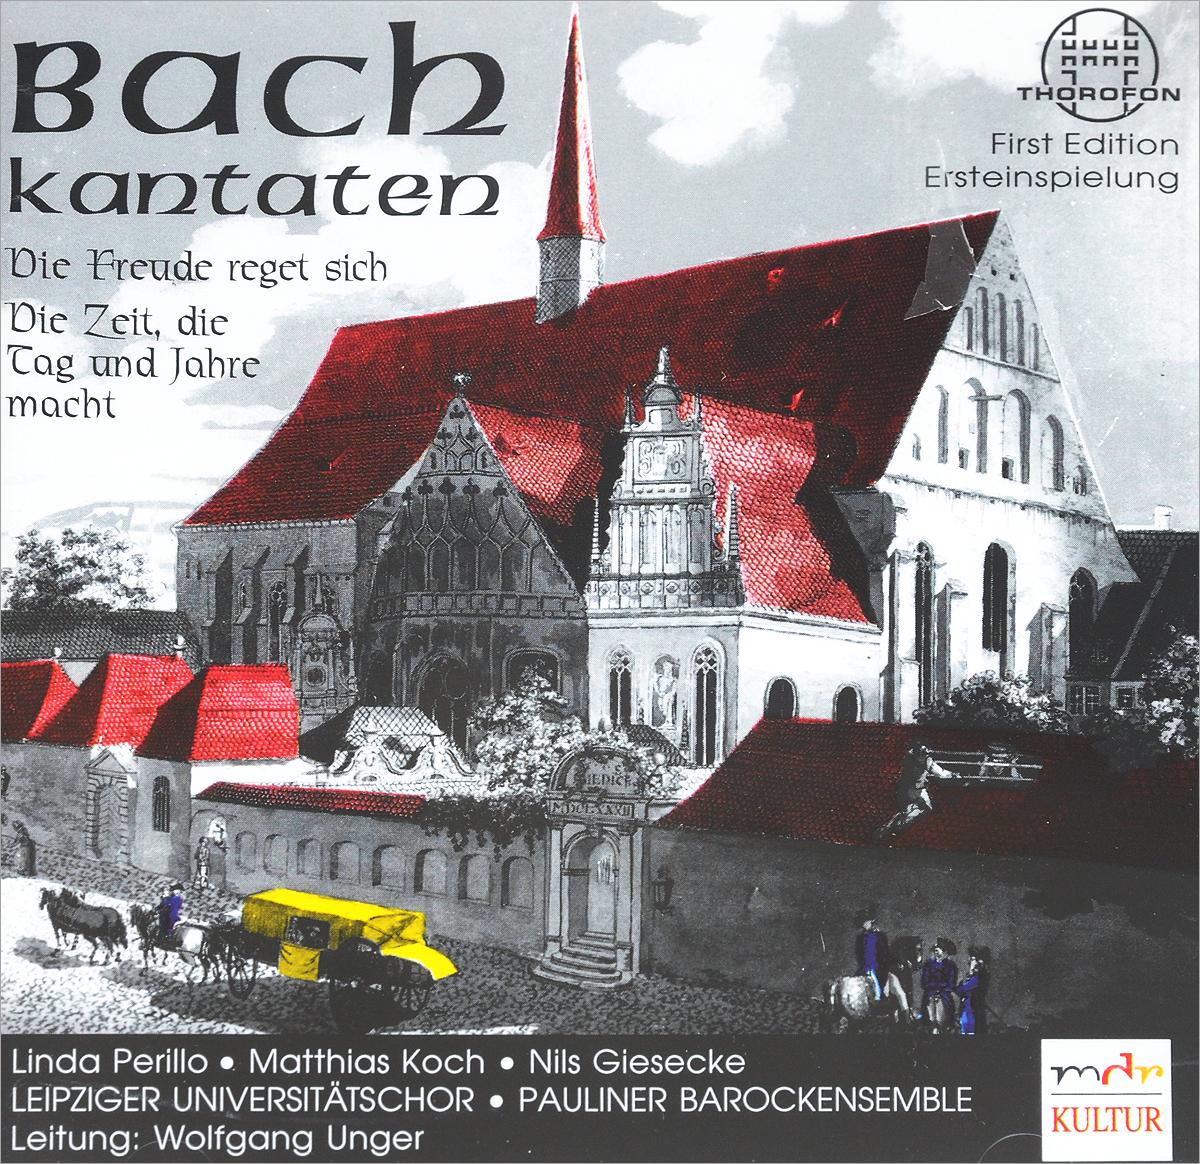 Иоганн Себастьян Бах J.S. Bach. Kantaten иоганн себастьян бах sicilienne